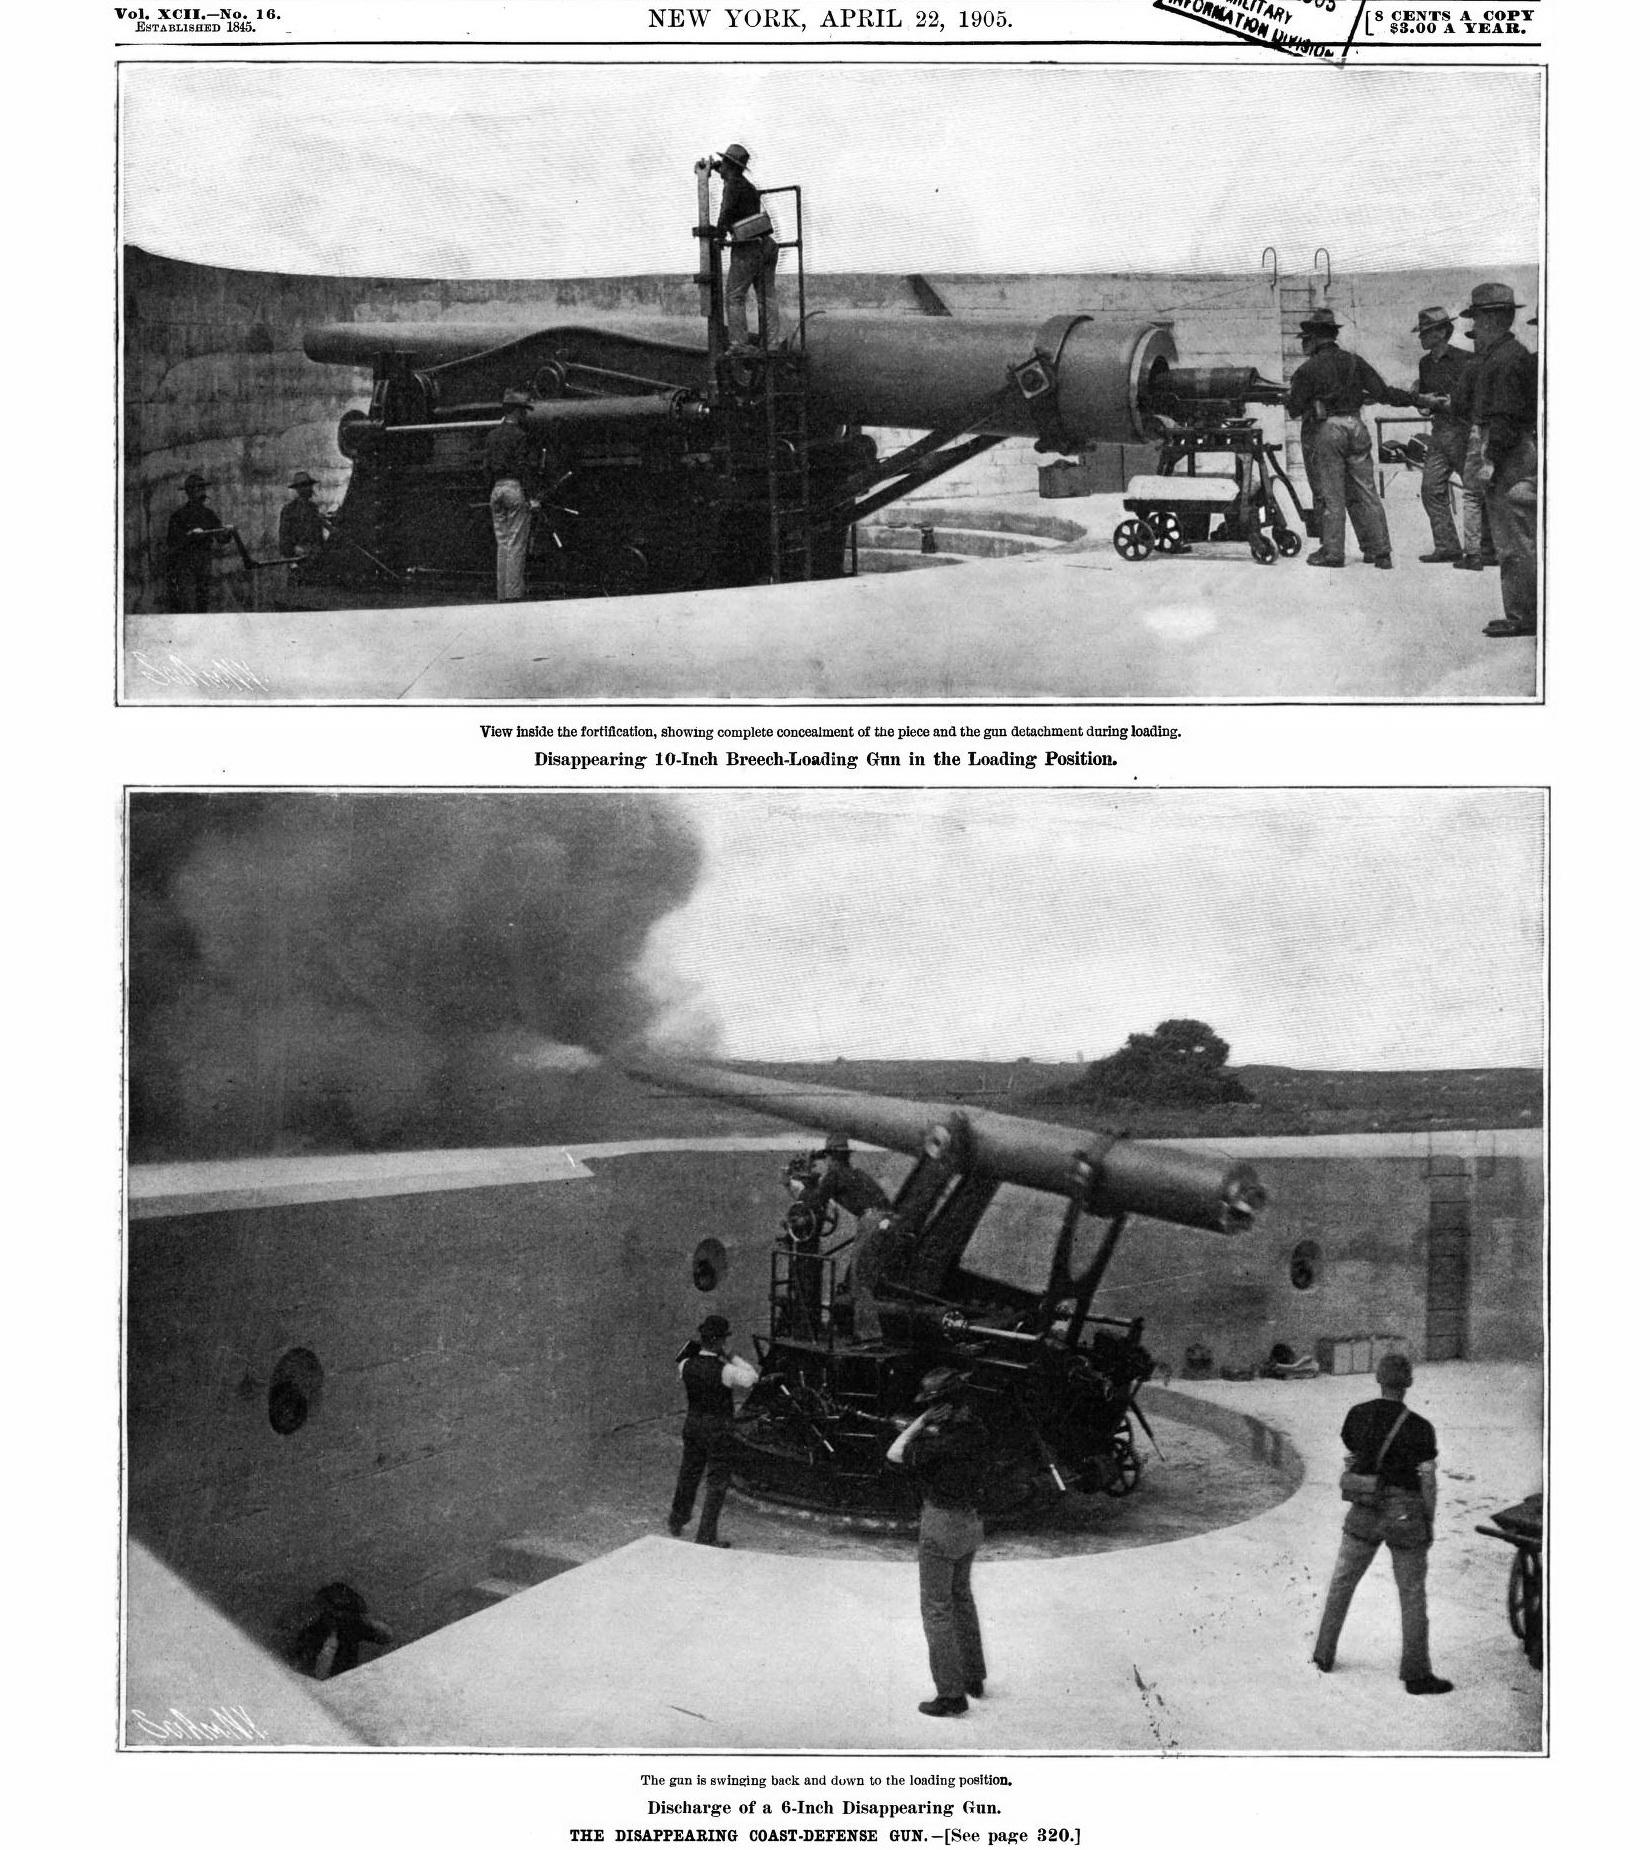 Canon à éclipse 19-8558581-10-dm-i-6-dm-beregovye-scientific-american-v92-n16-1905-04-22-0000